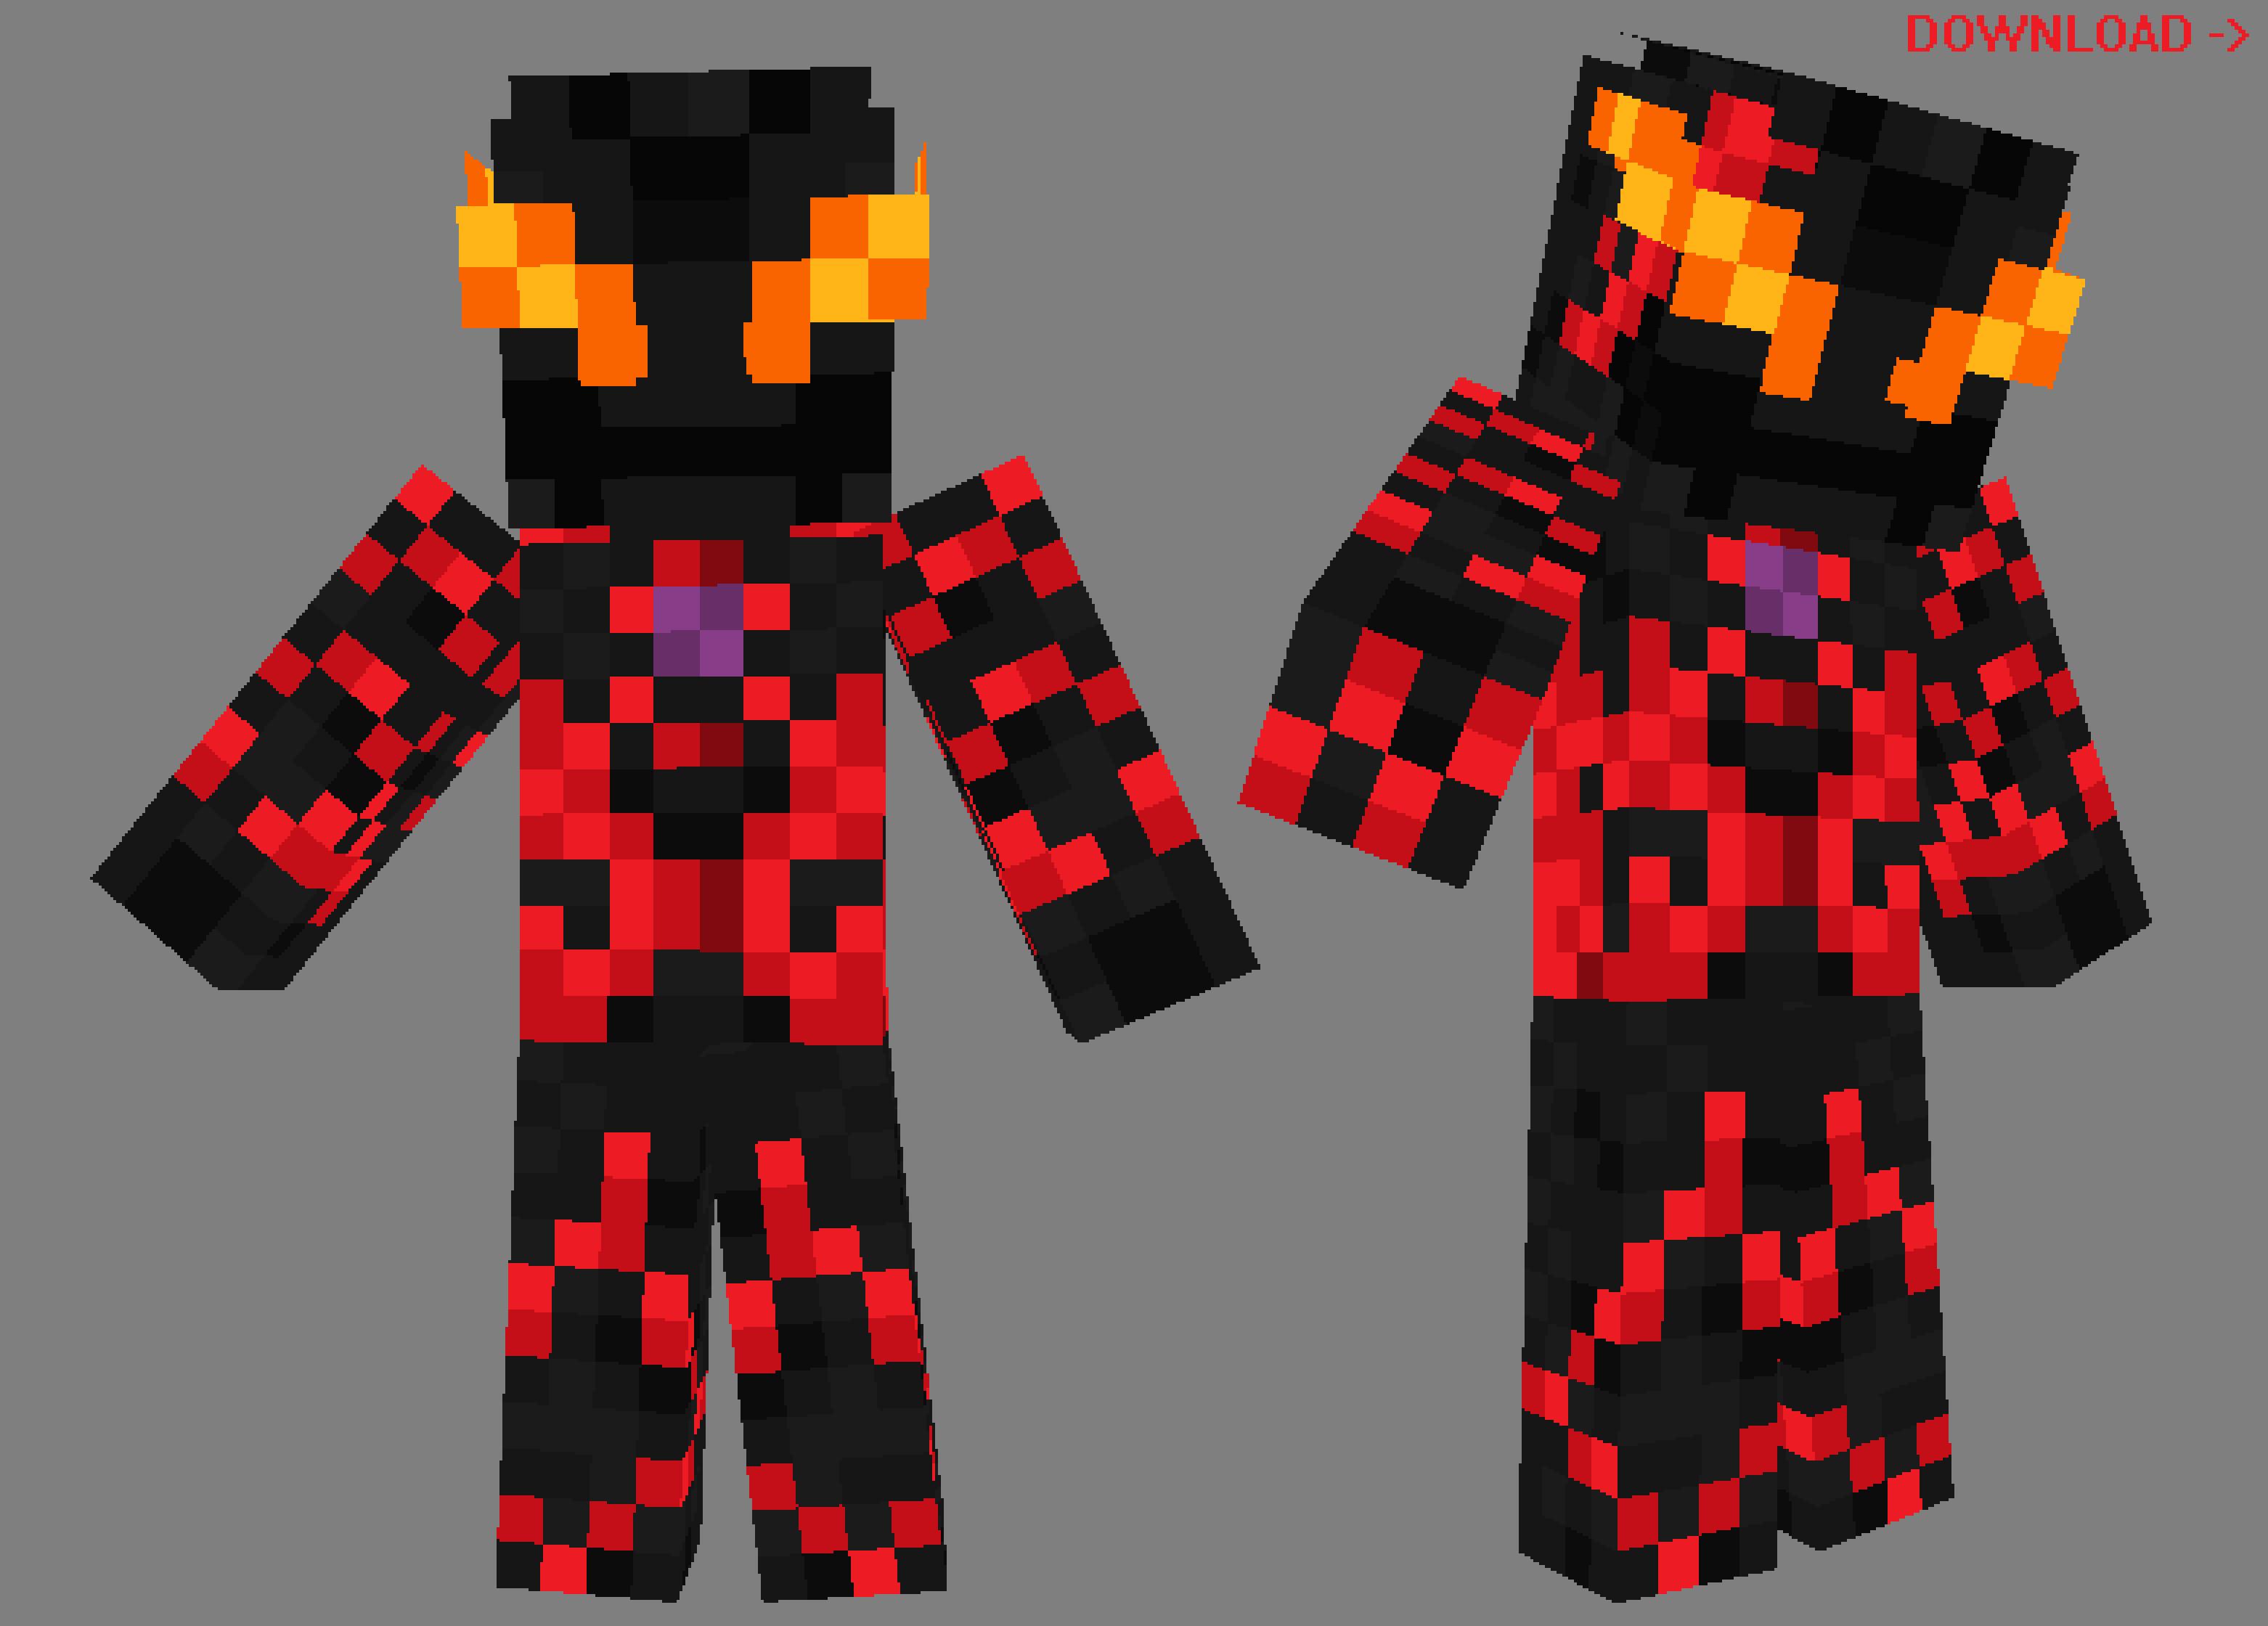 Ultraman Belial Minecraft Player Skin Pack by Burninggodzillalord